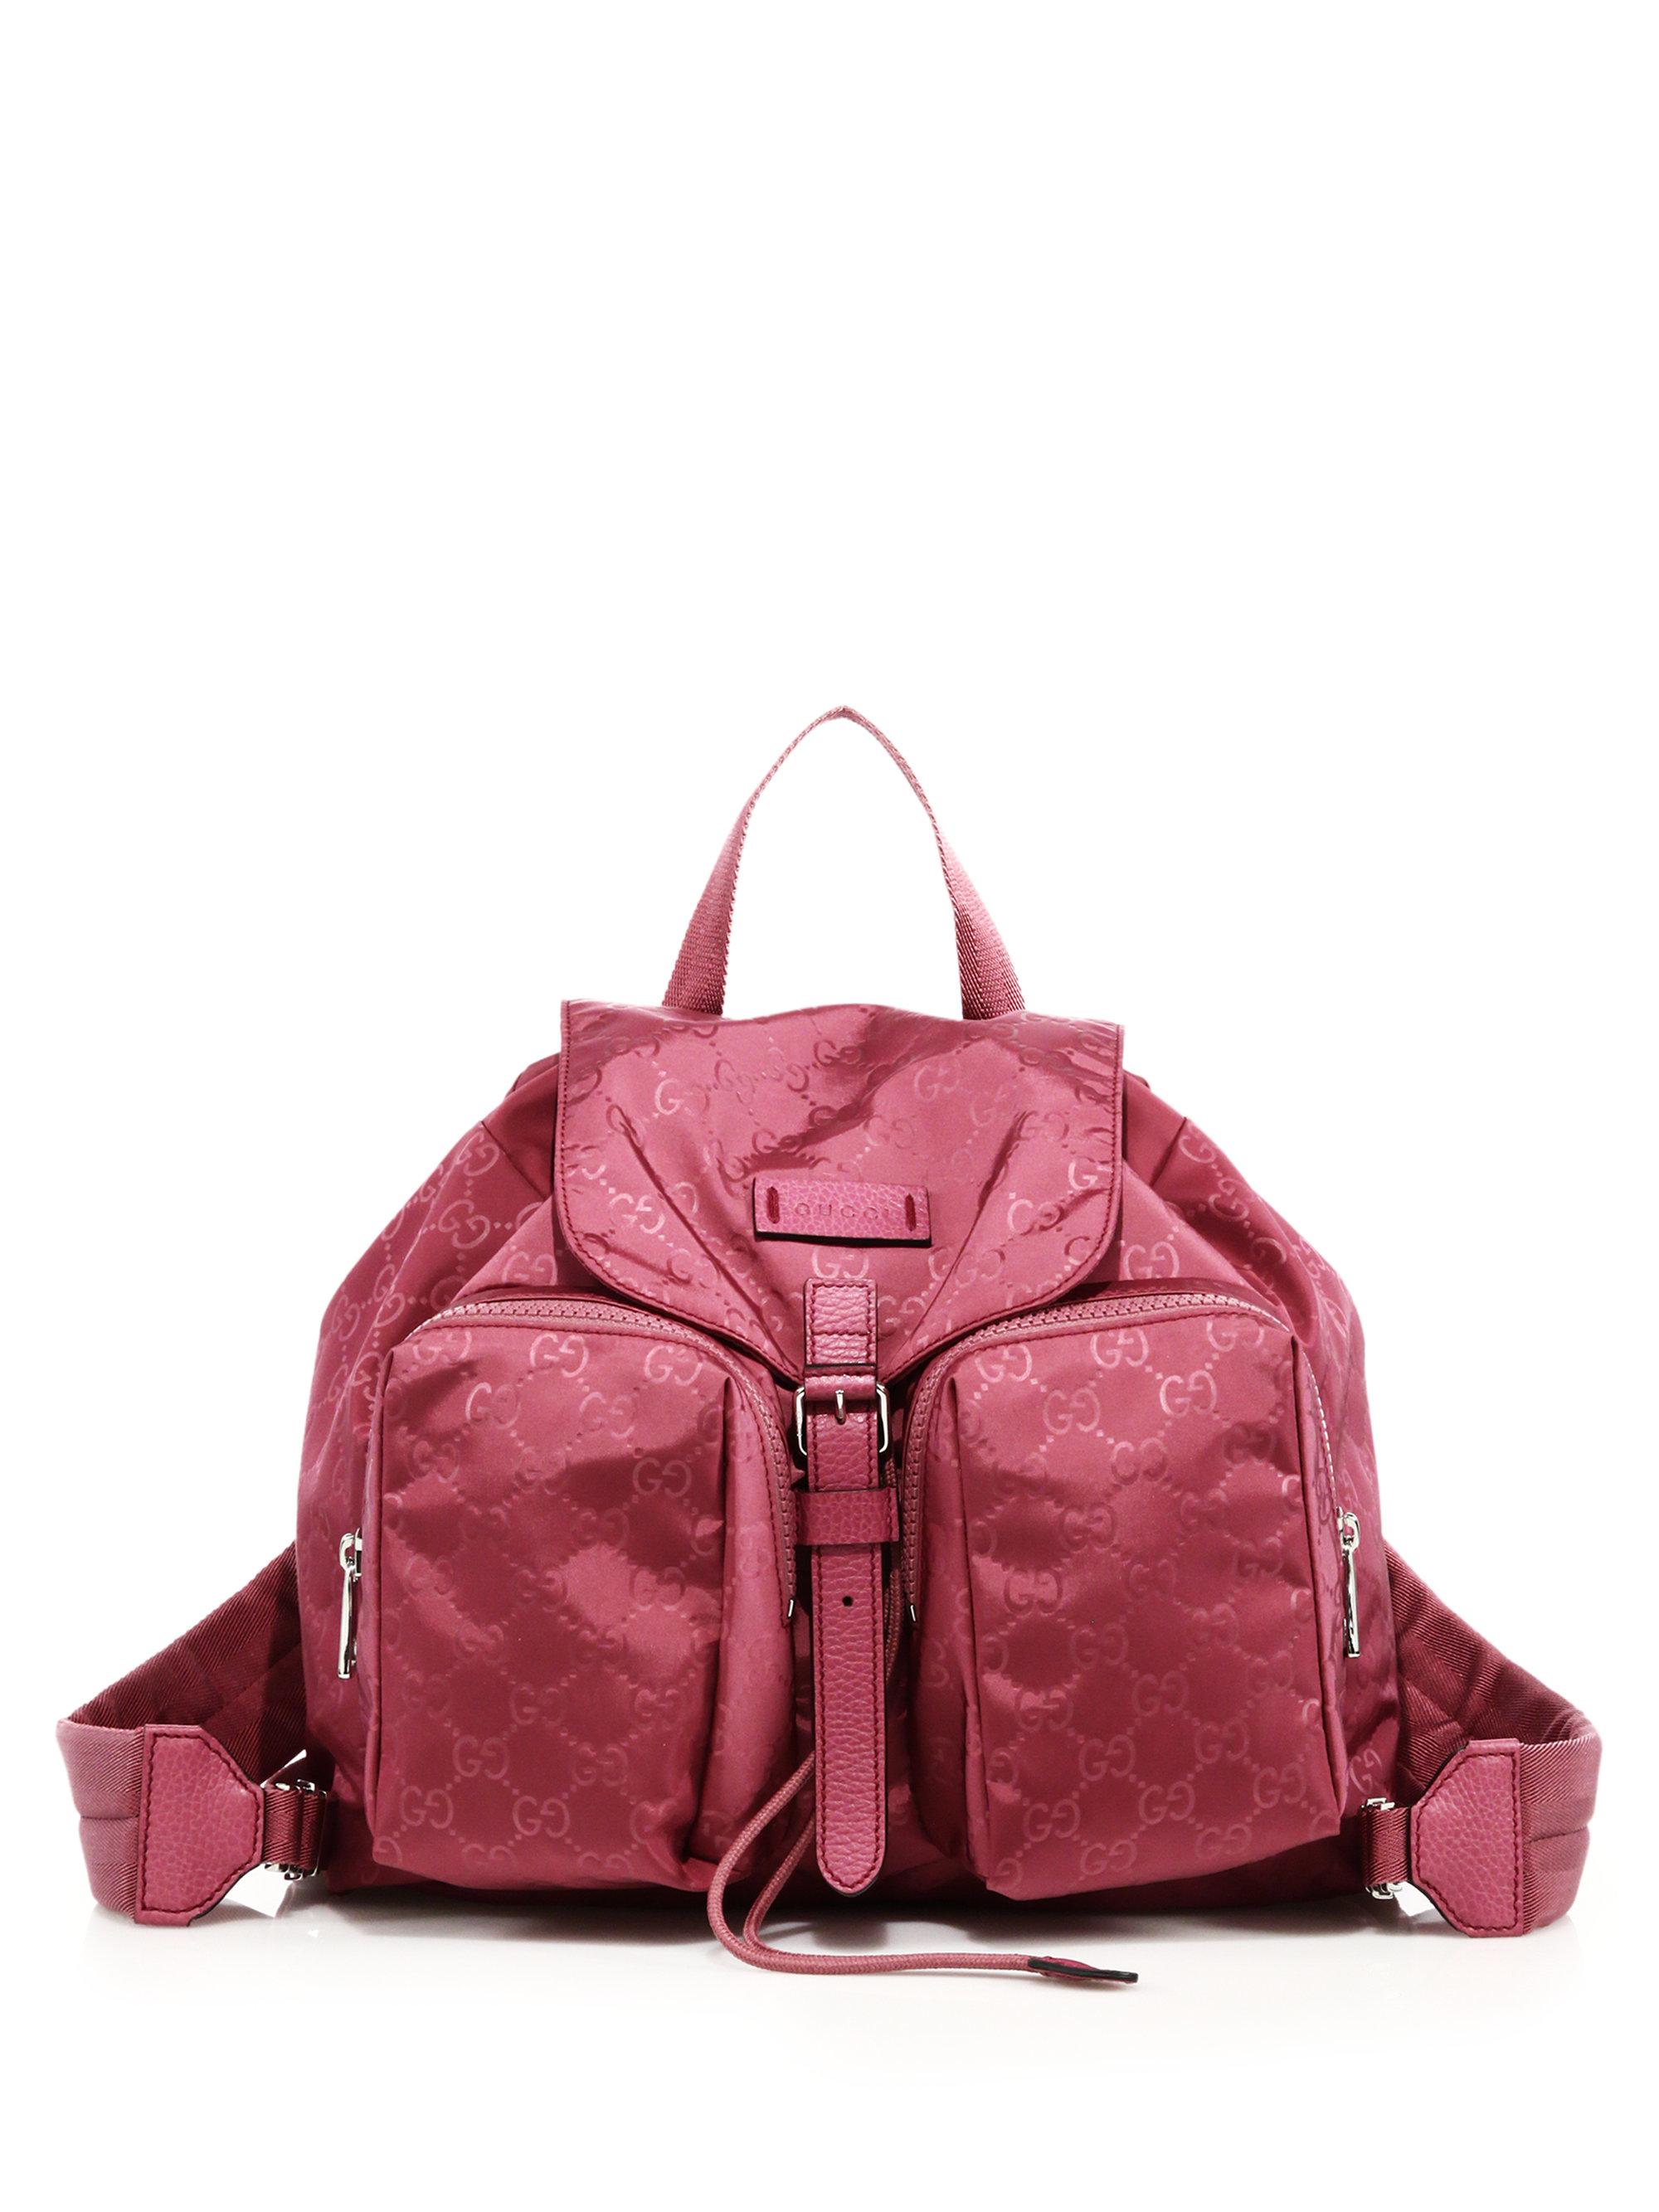 efec1e8f6b9 Lyst - Gucci Nylon Ssima Light Backpack in Pink